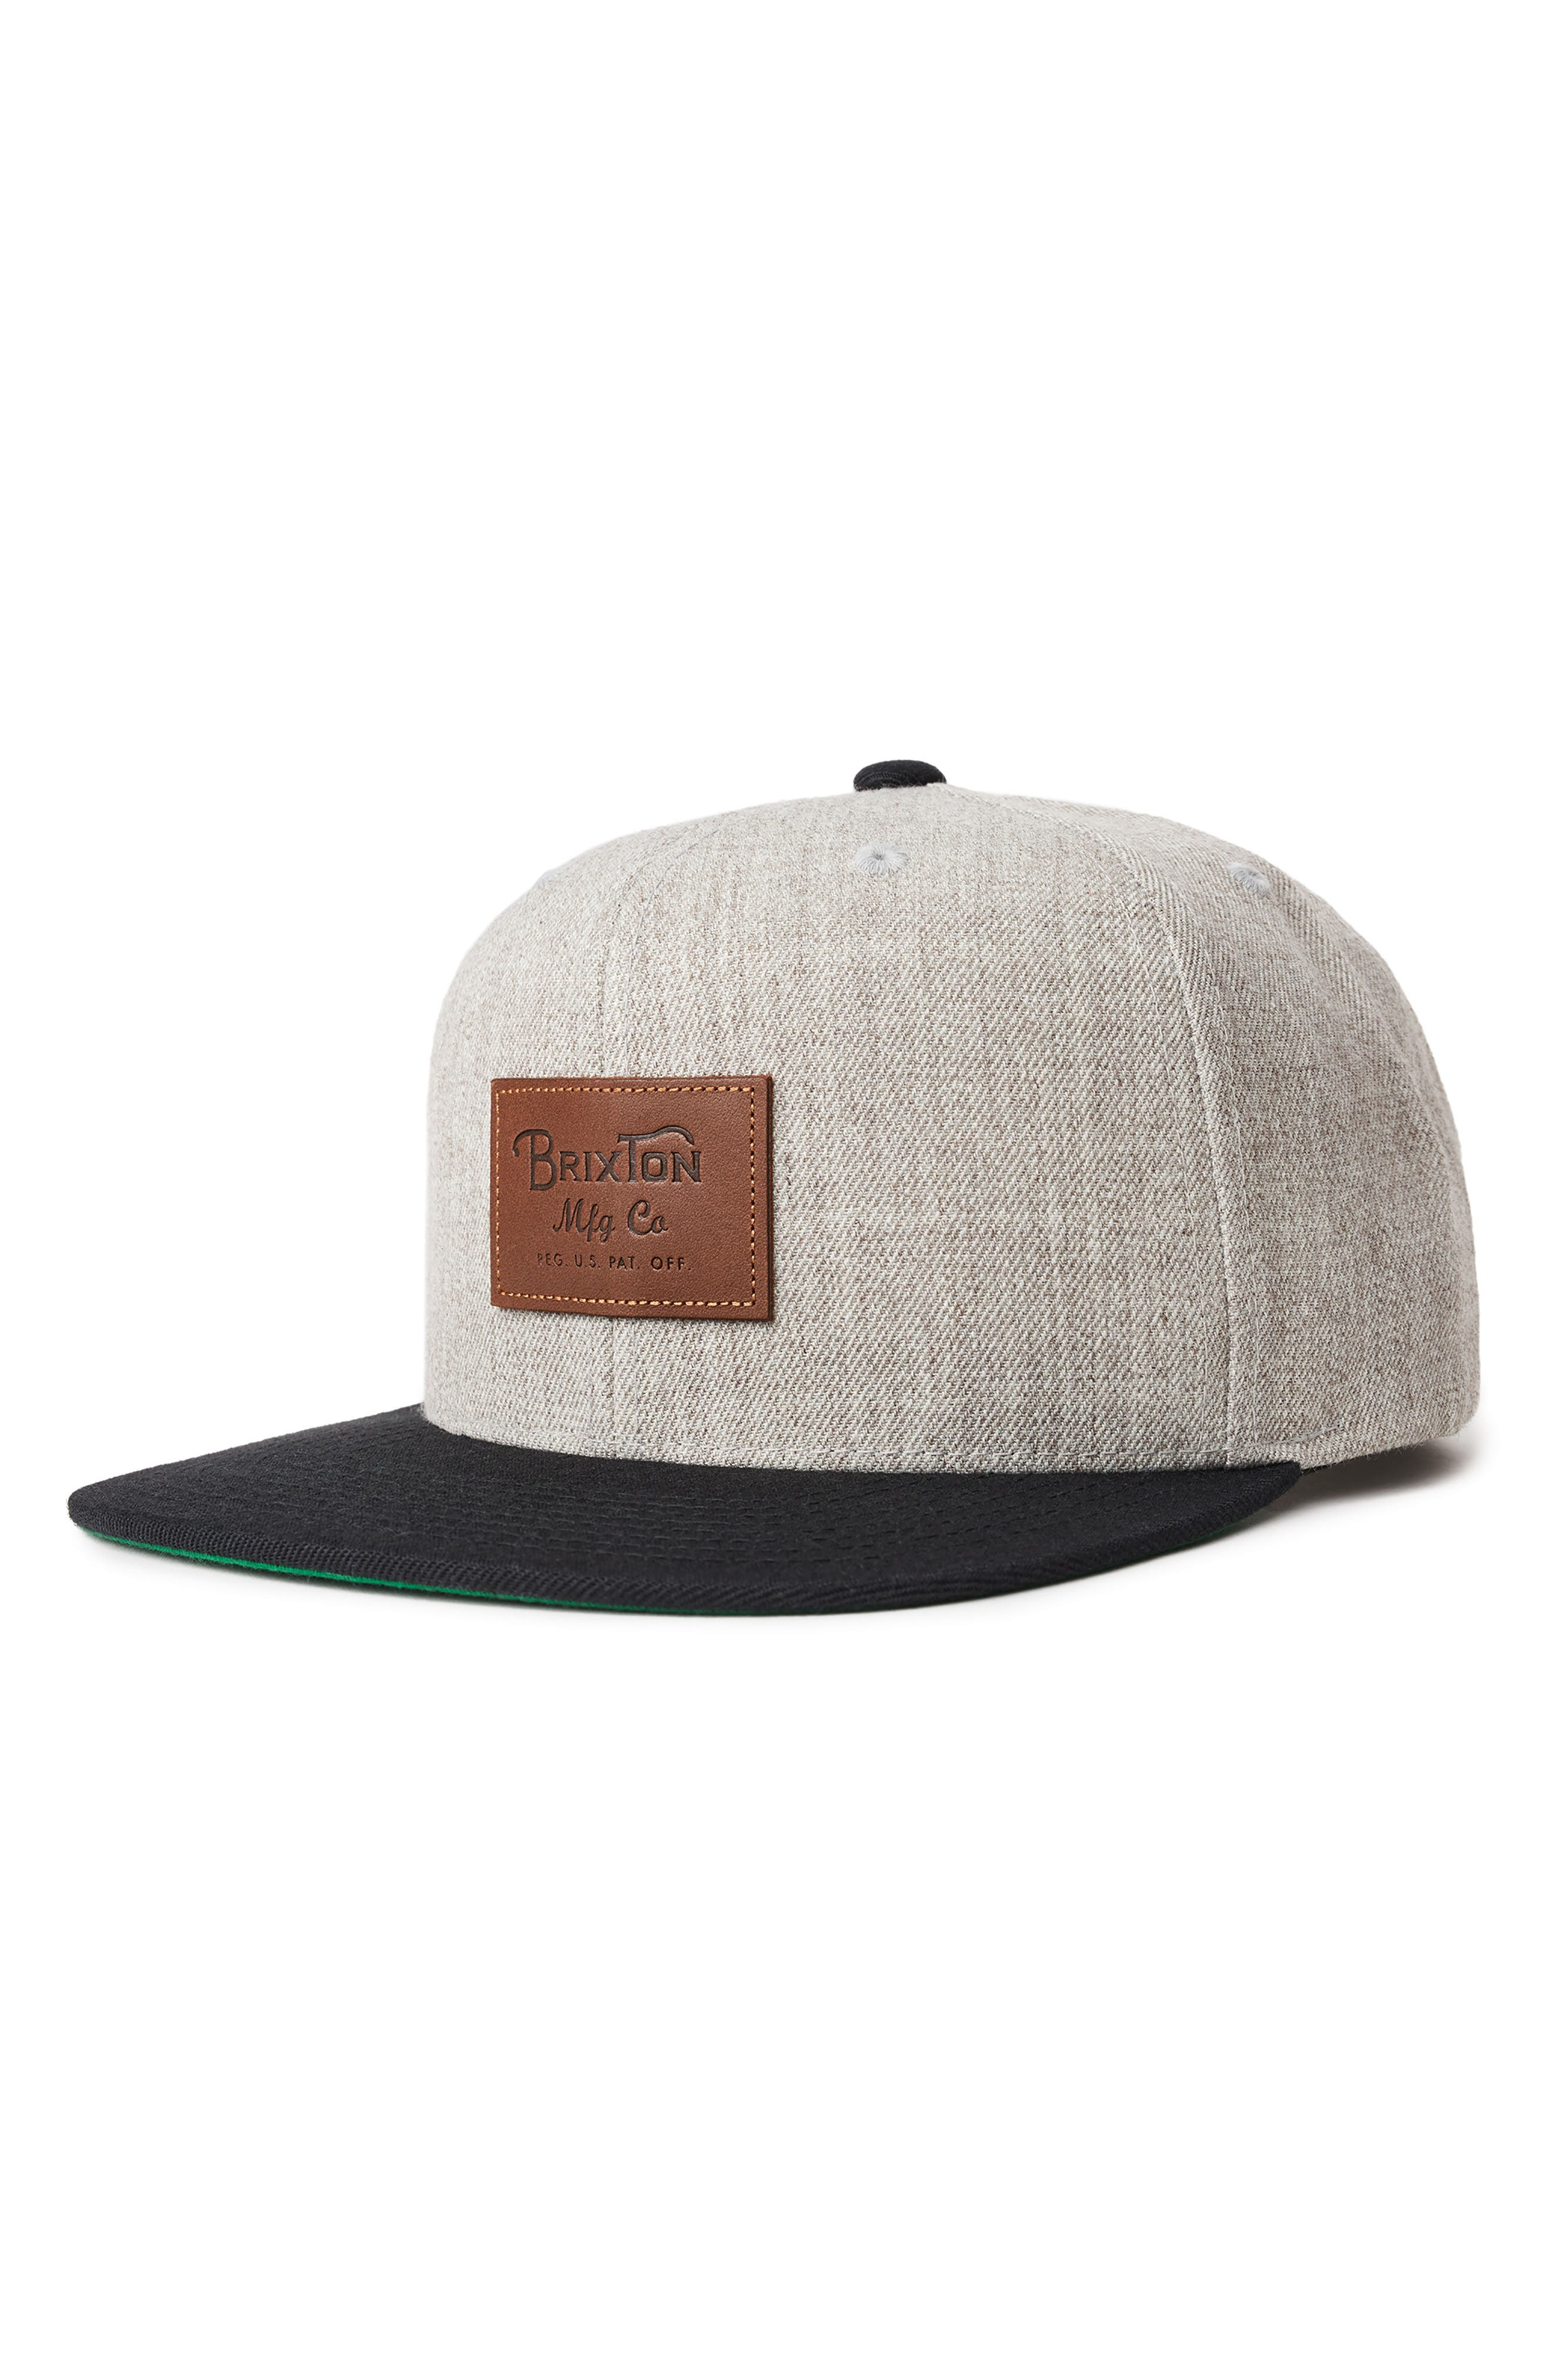 Grade II Snapback Baseball Cap,                         Main,                         color, LIGHT HEATHER GREY/ BLACK